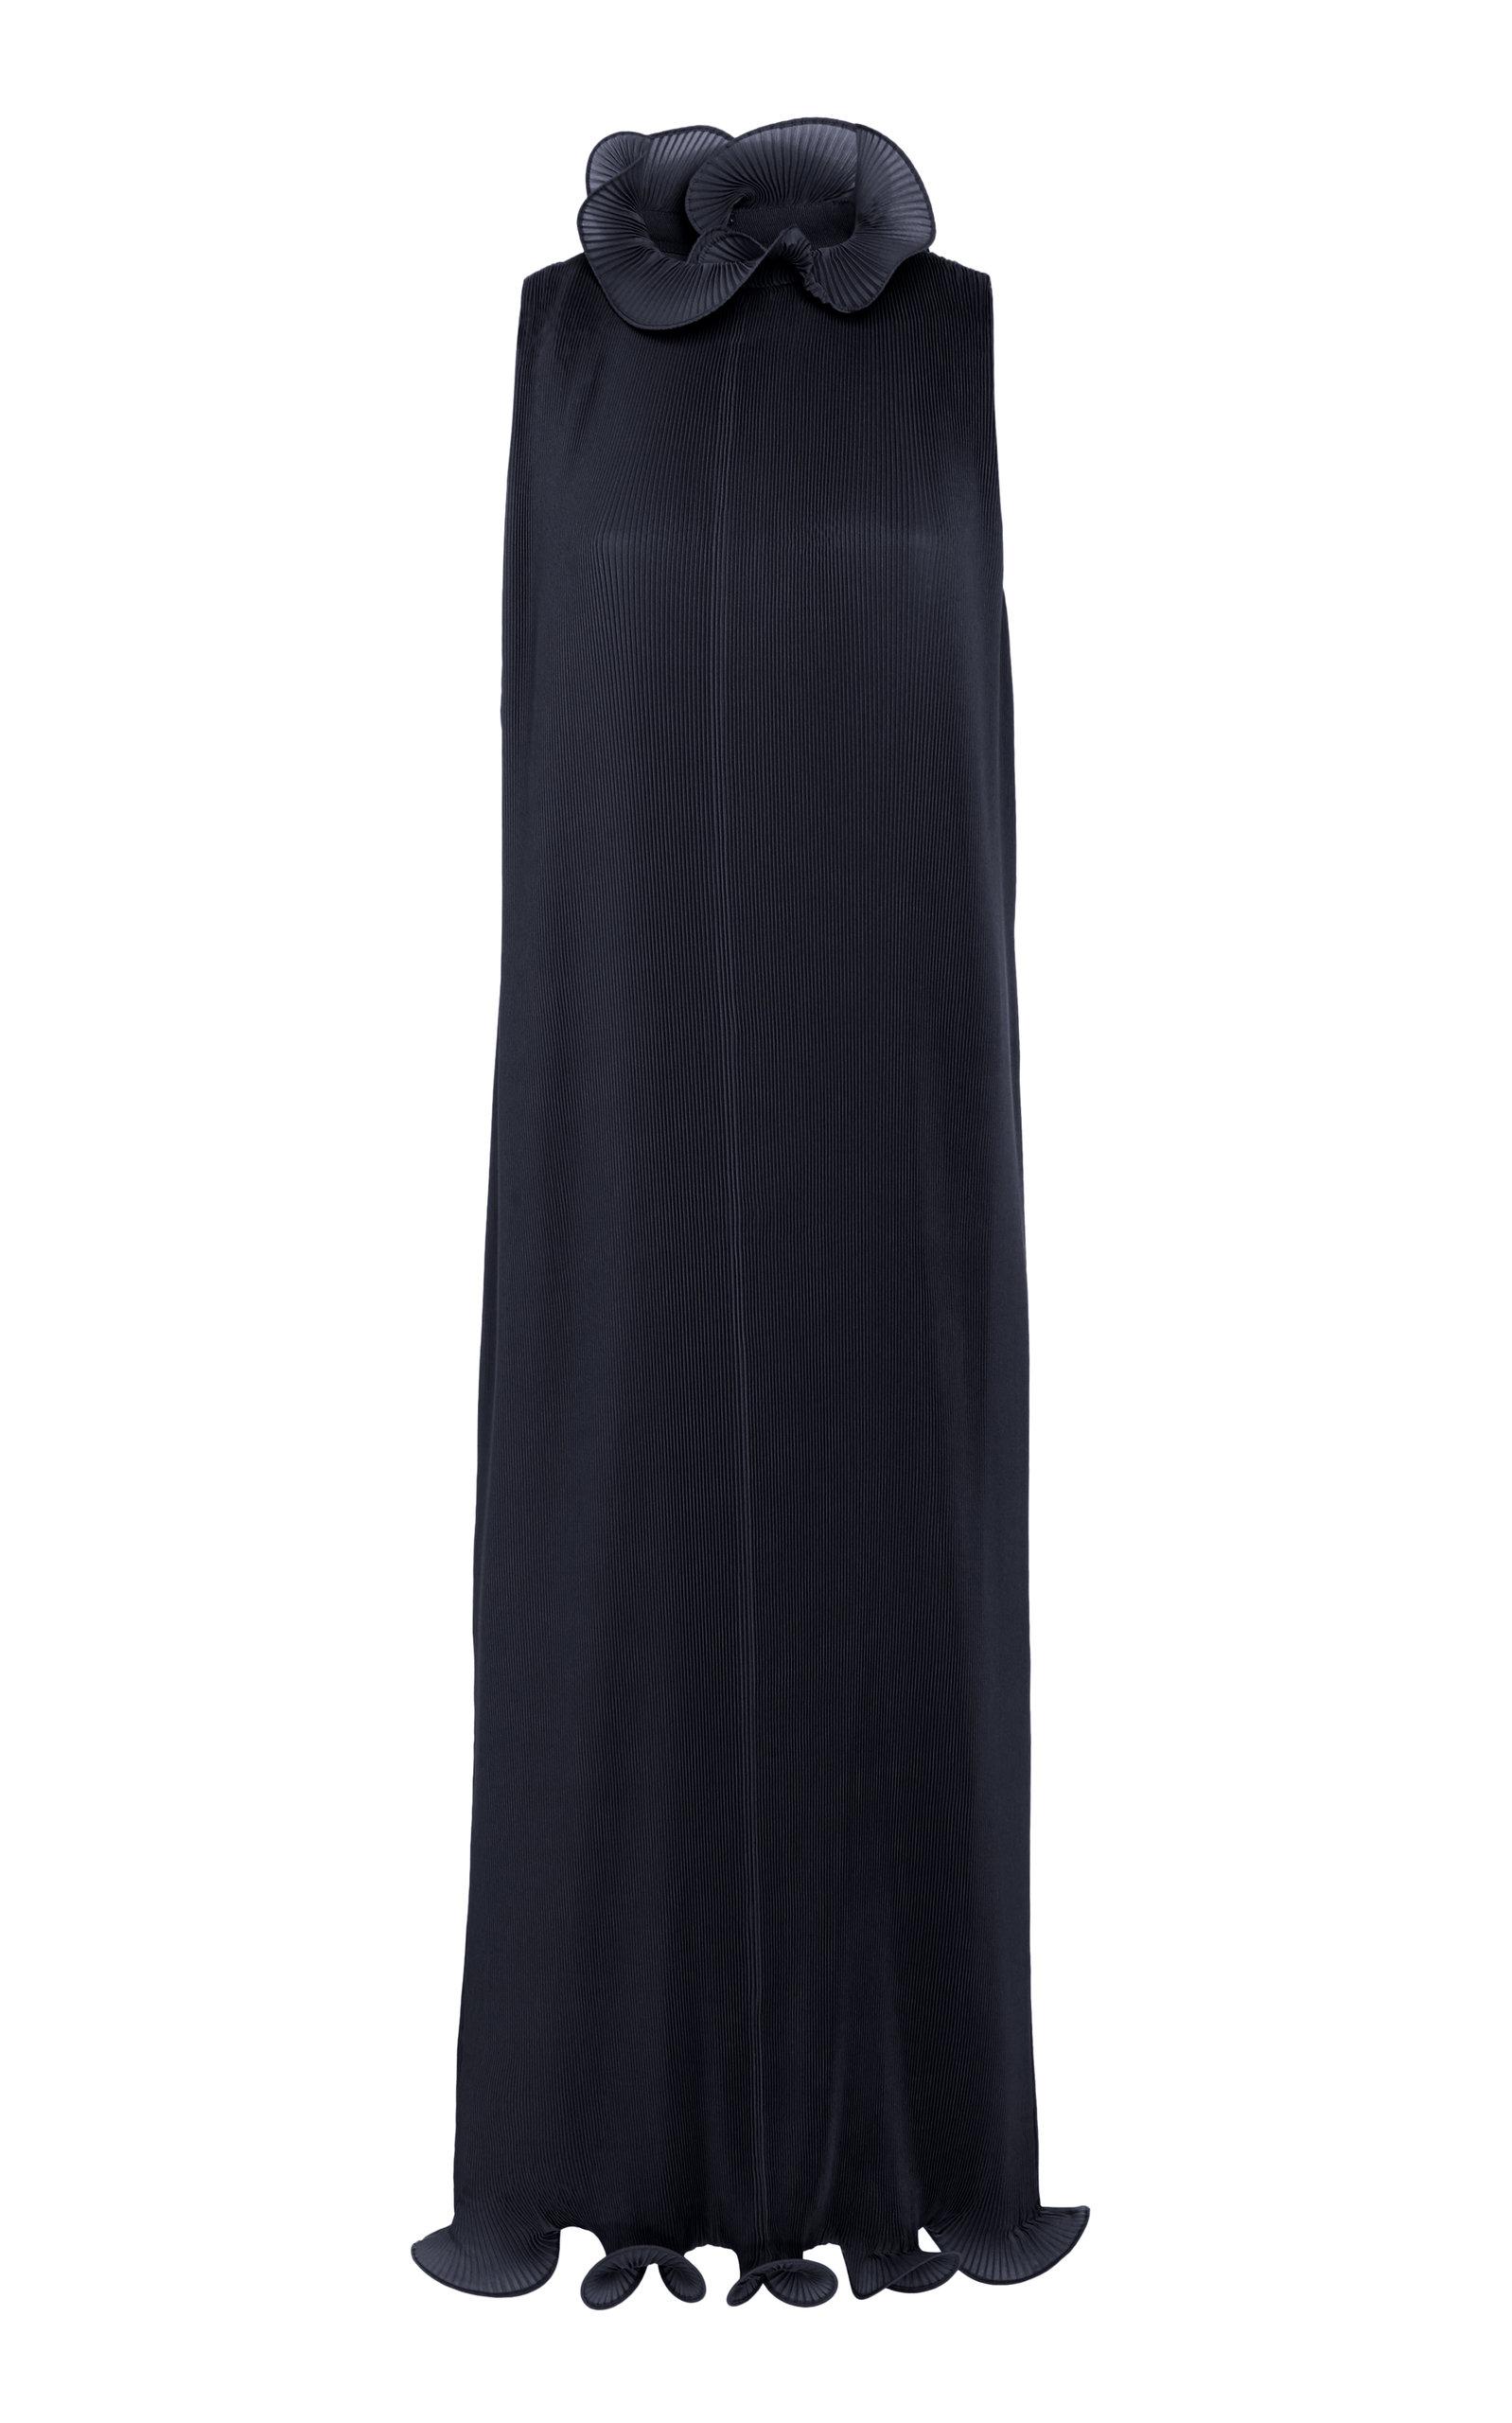 Buy Tibi Pleated Ruffled Plissé Midi Dress online, shop Tibi at the best price